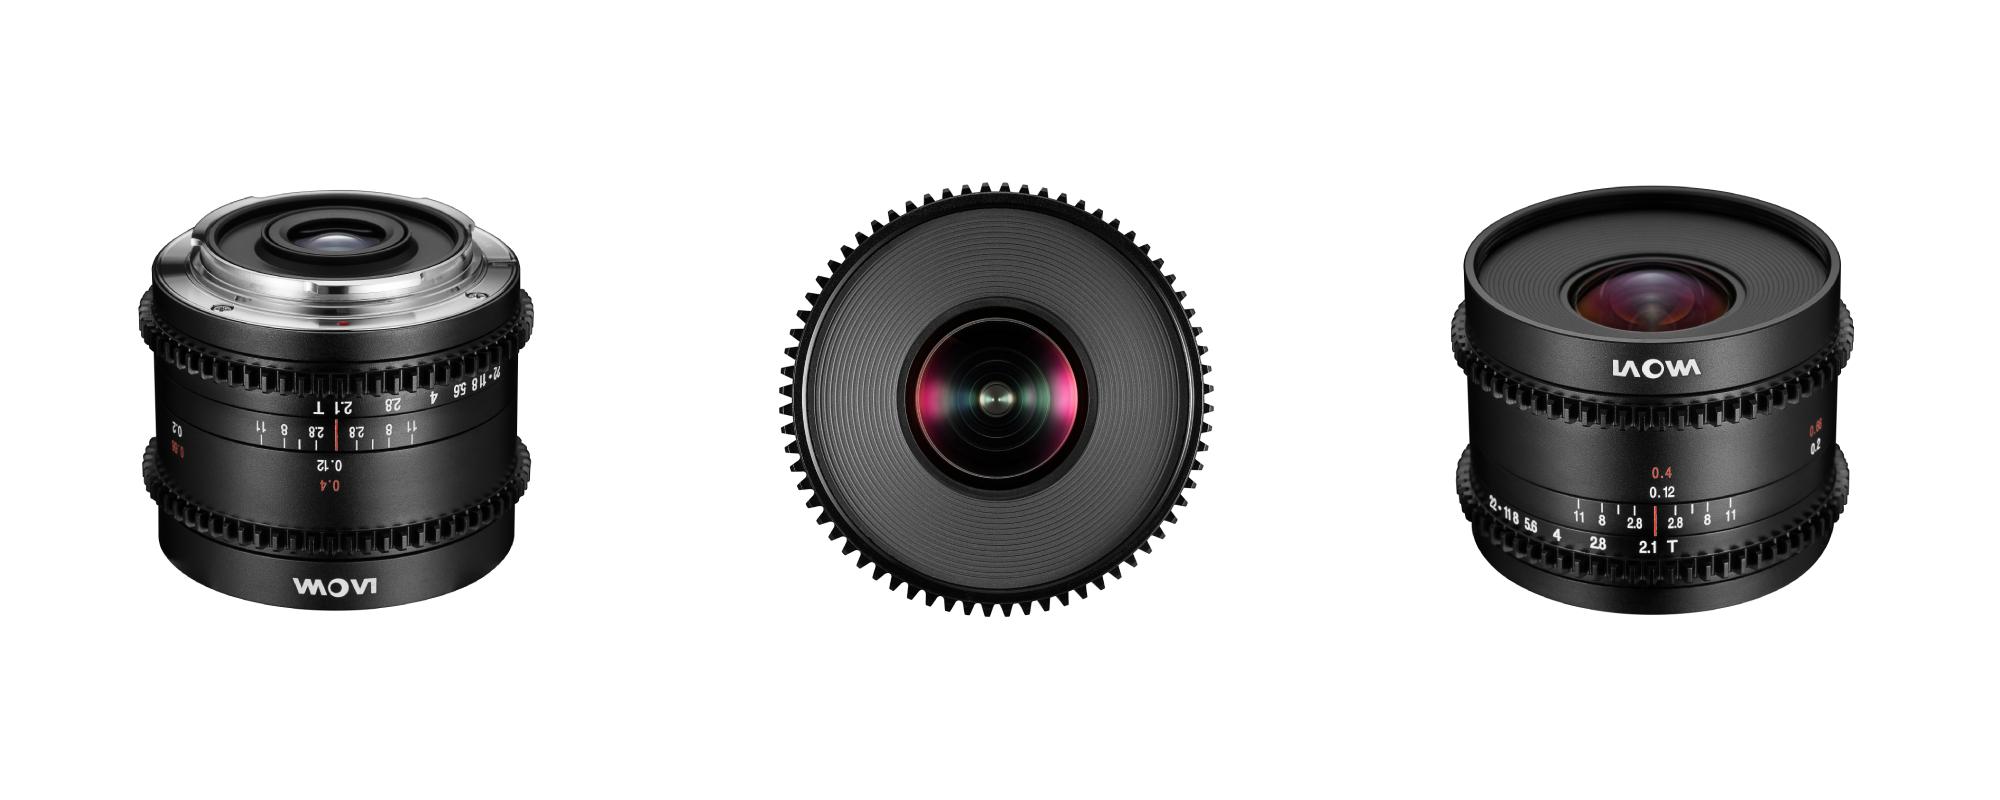 Venus Optics Laowa 7.5mm T2.1 to Micro 4/3 Cine lens on white background